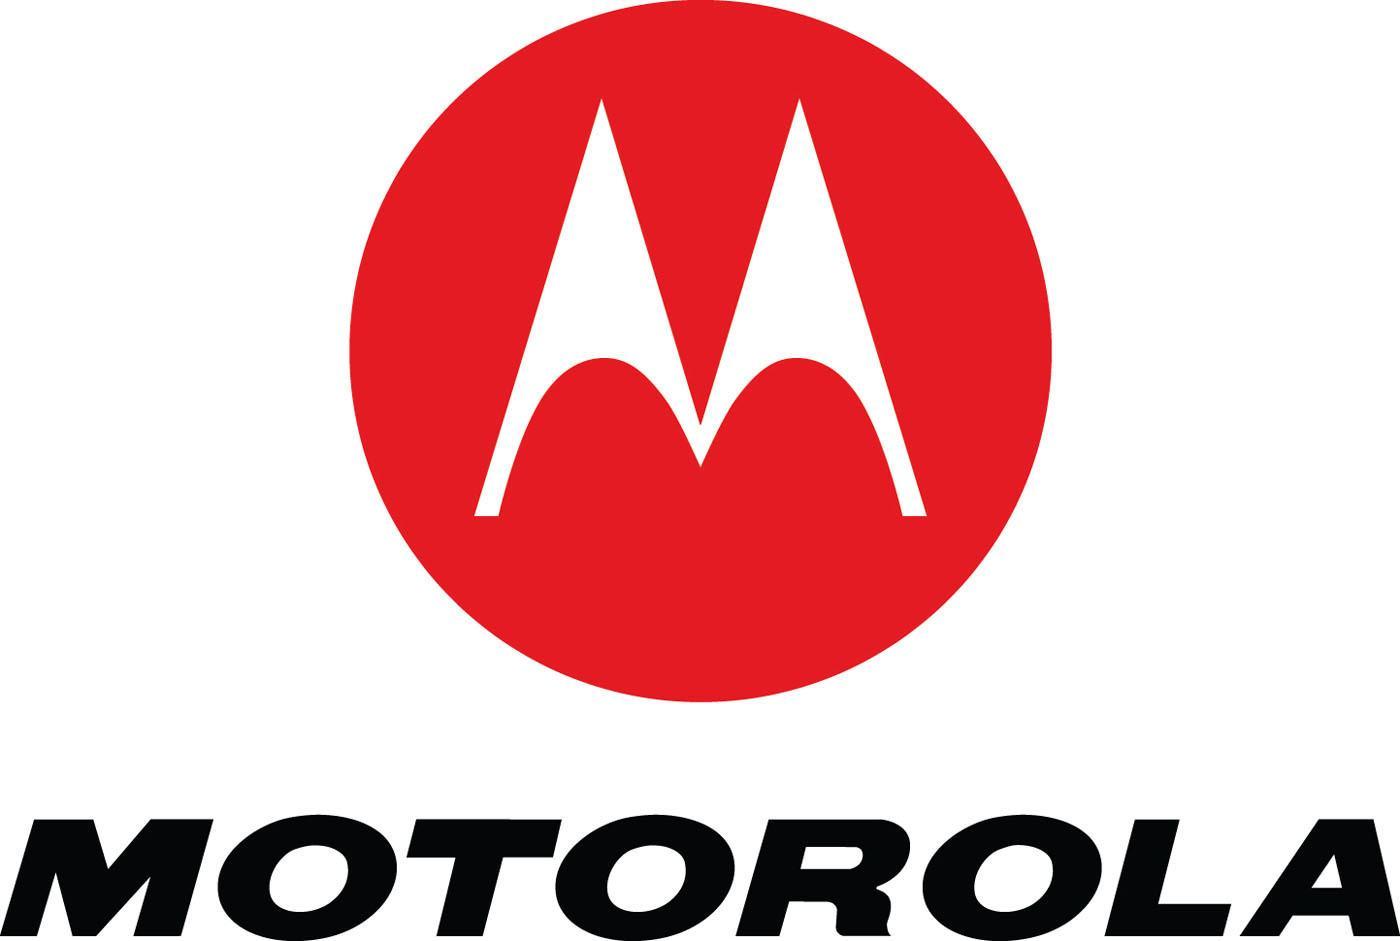 Motorola Moto XT1578, XT1585 & XT192A mit QHD-Auflösung? 1 techboys.de • smarte News, auf den Punkt! Motorola Moto XT1578, XT1585 & XT192A mit QHD-Auflösung?